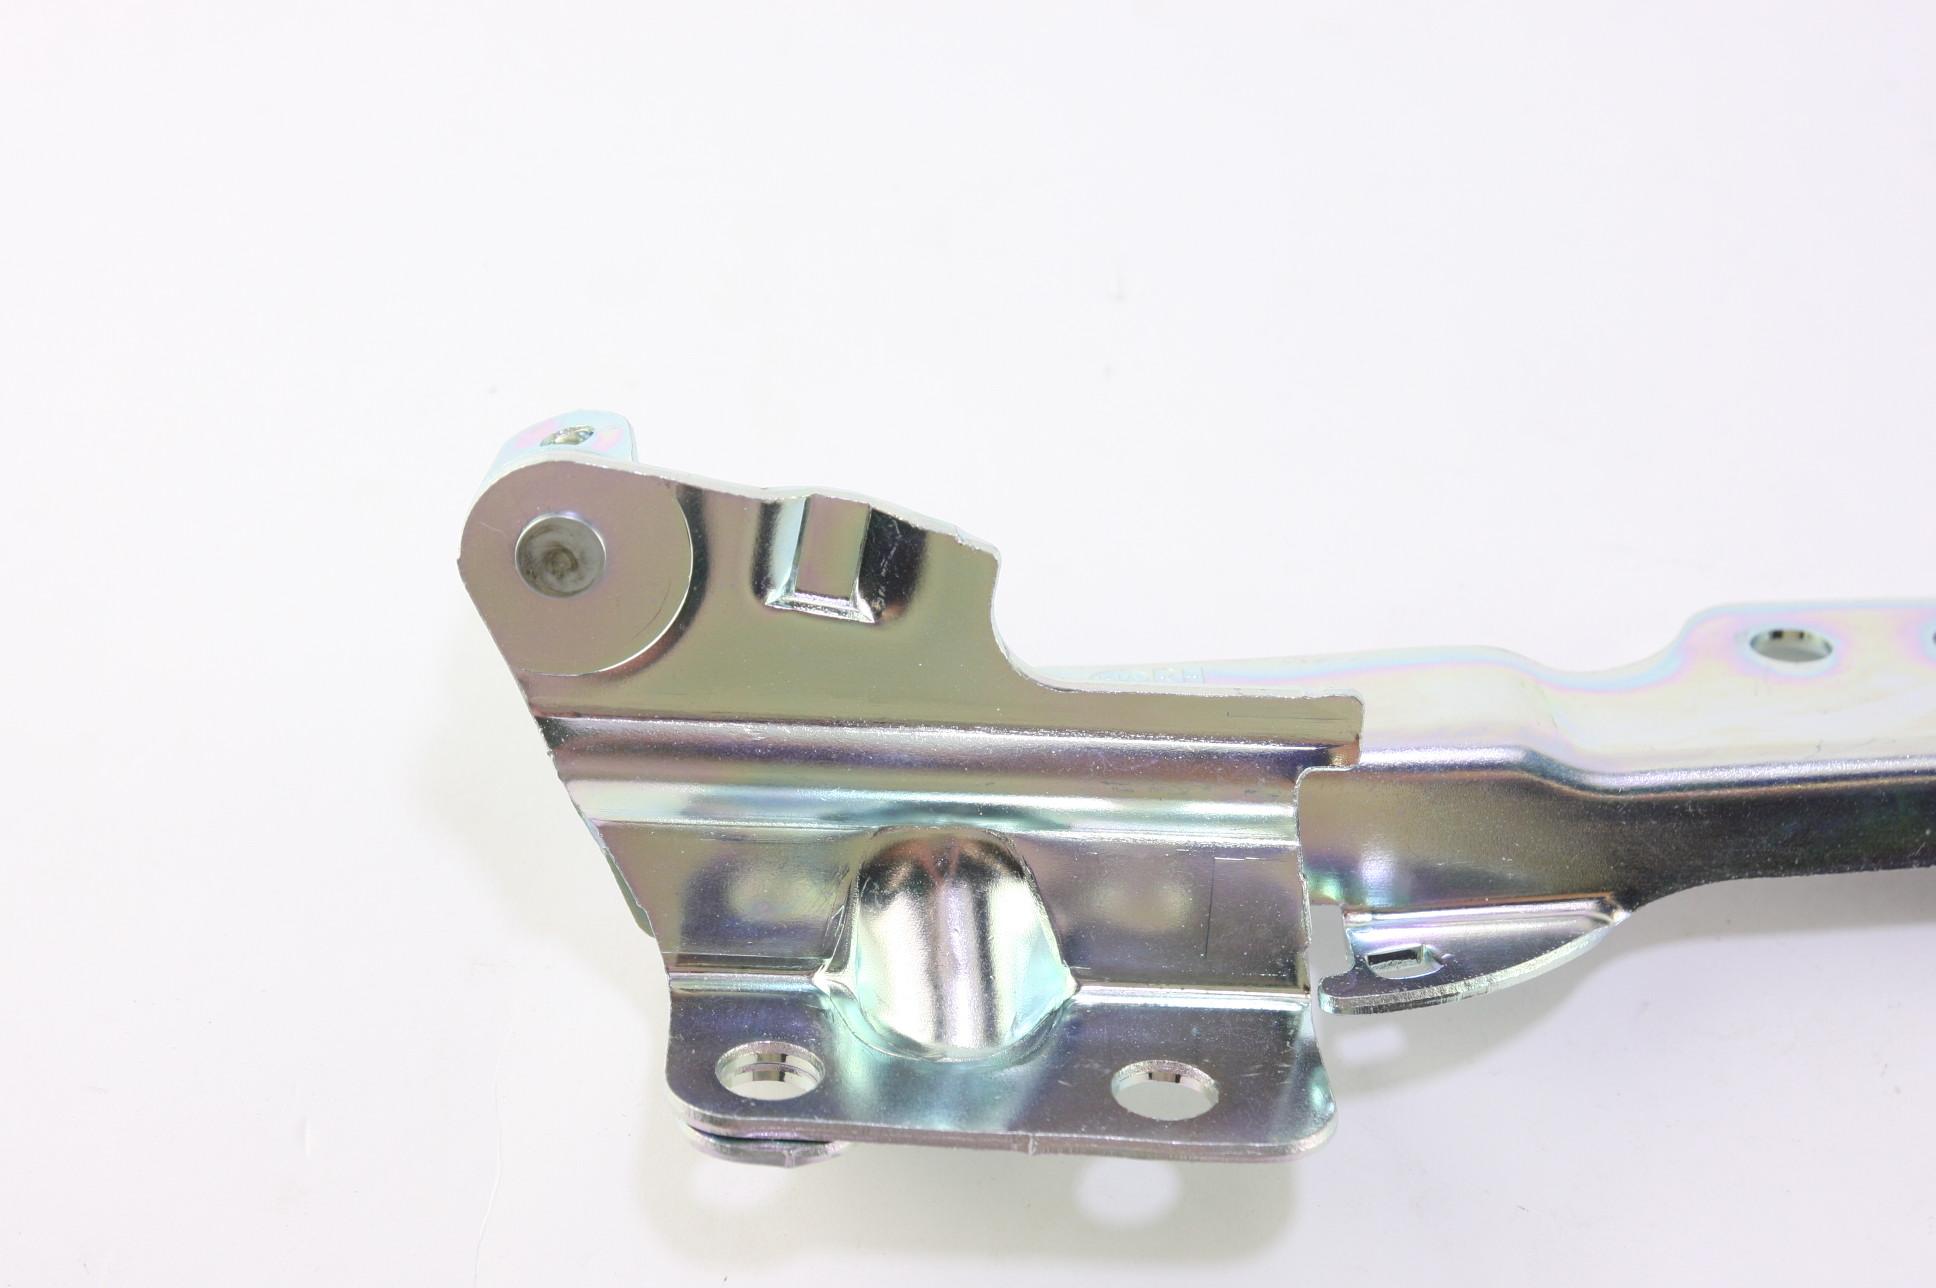 ** New Genuine KIA OEM 791203E000 Right Hood Hinge 2003-2009 Sorento NIP - image 8